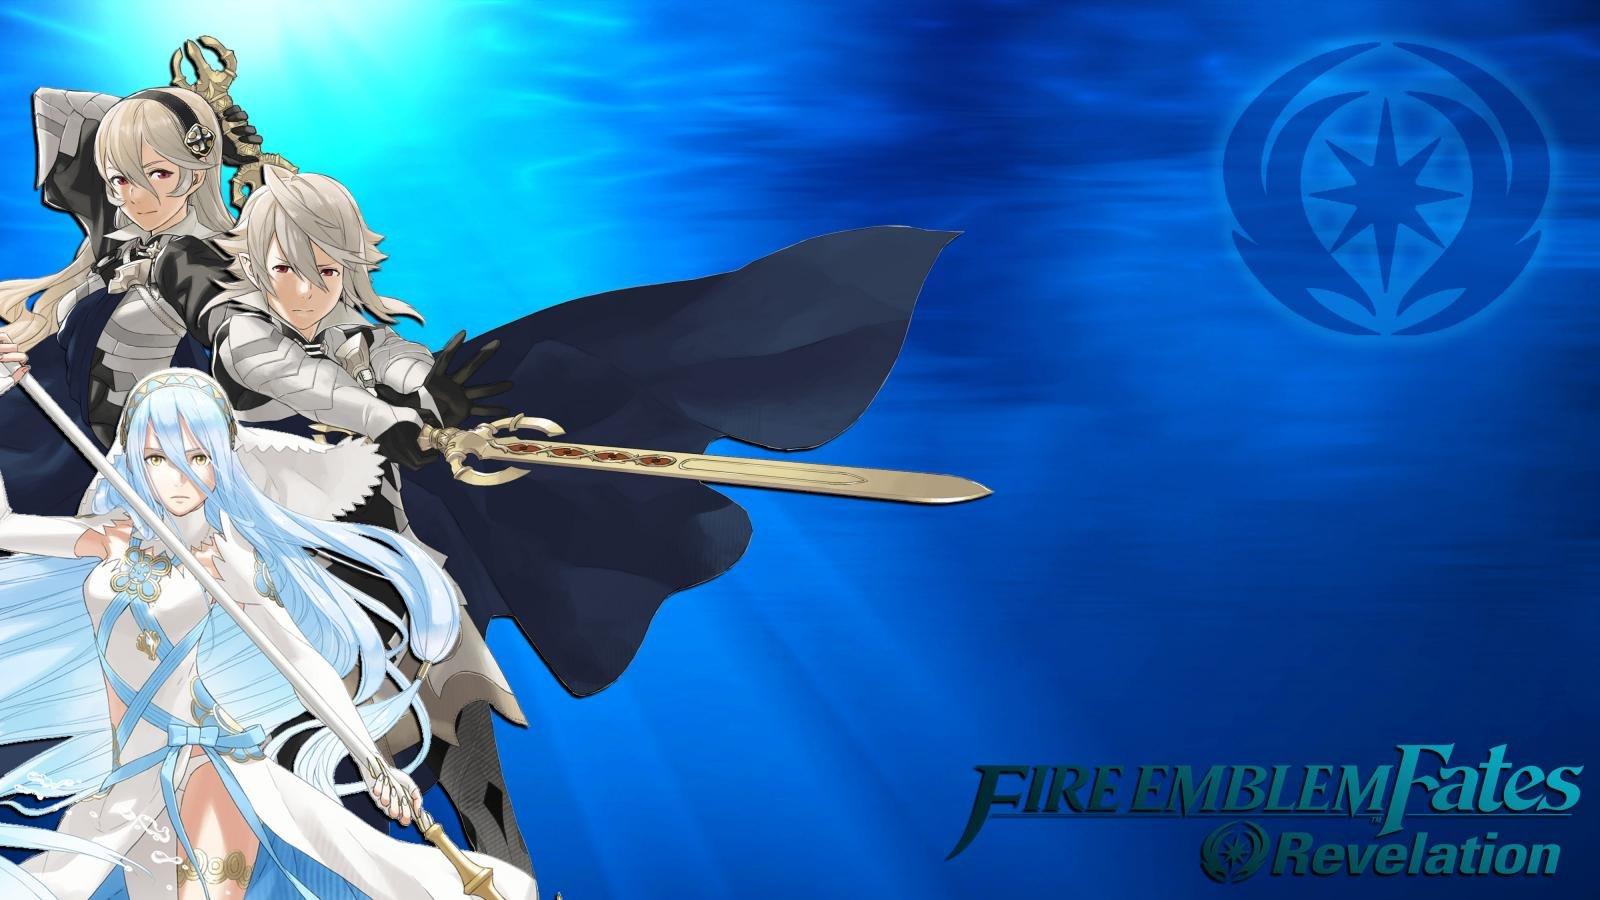 Fire Emblem Fates Wallpapers Hd For Desktop Backgrounds